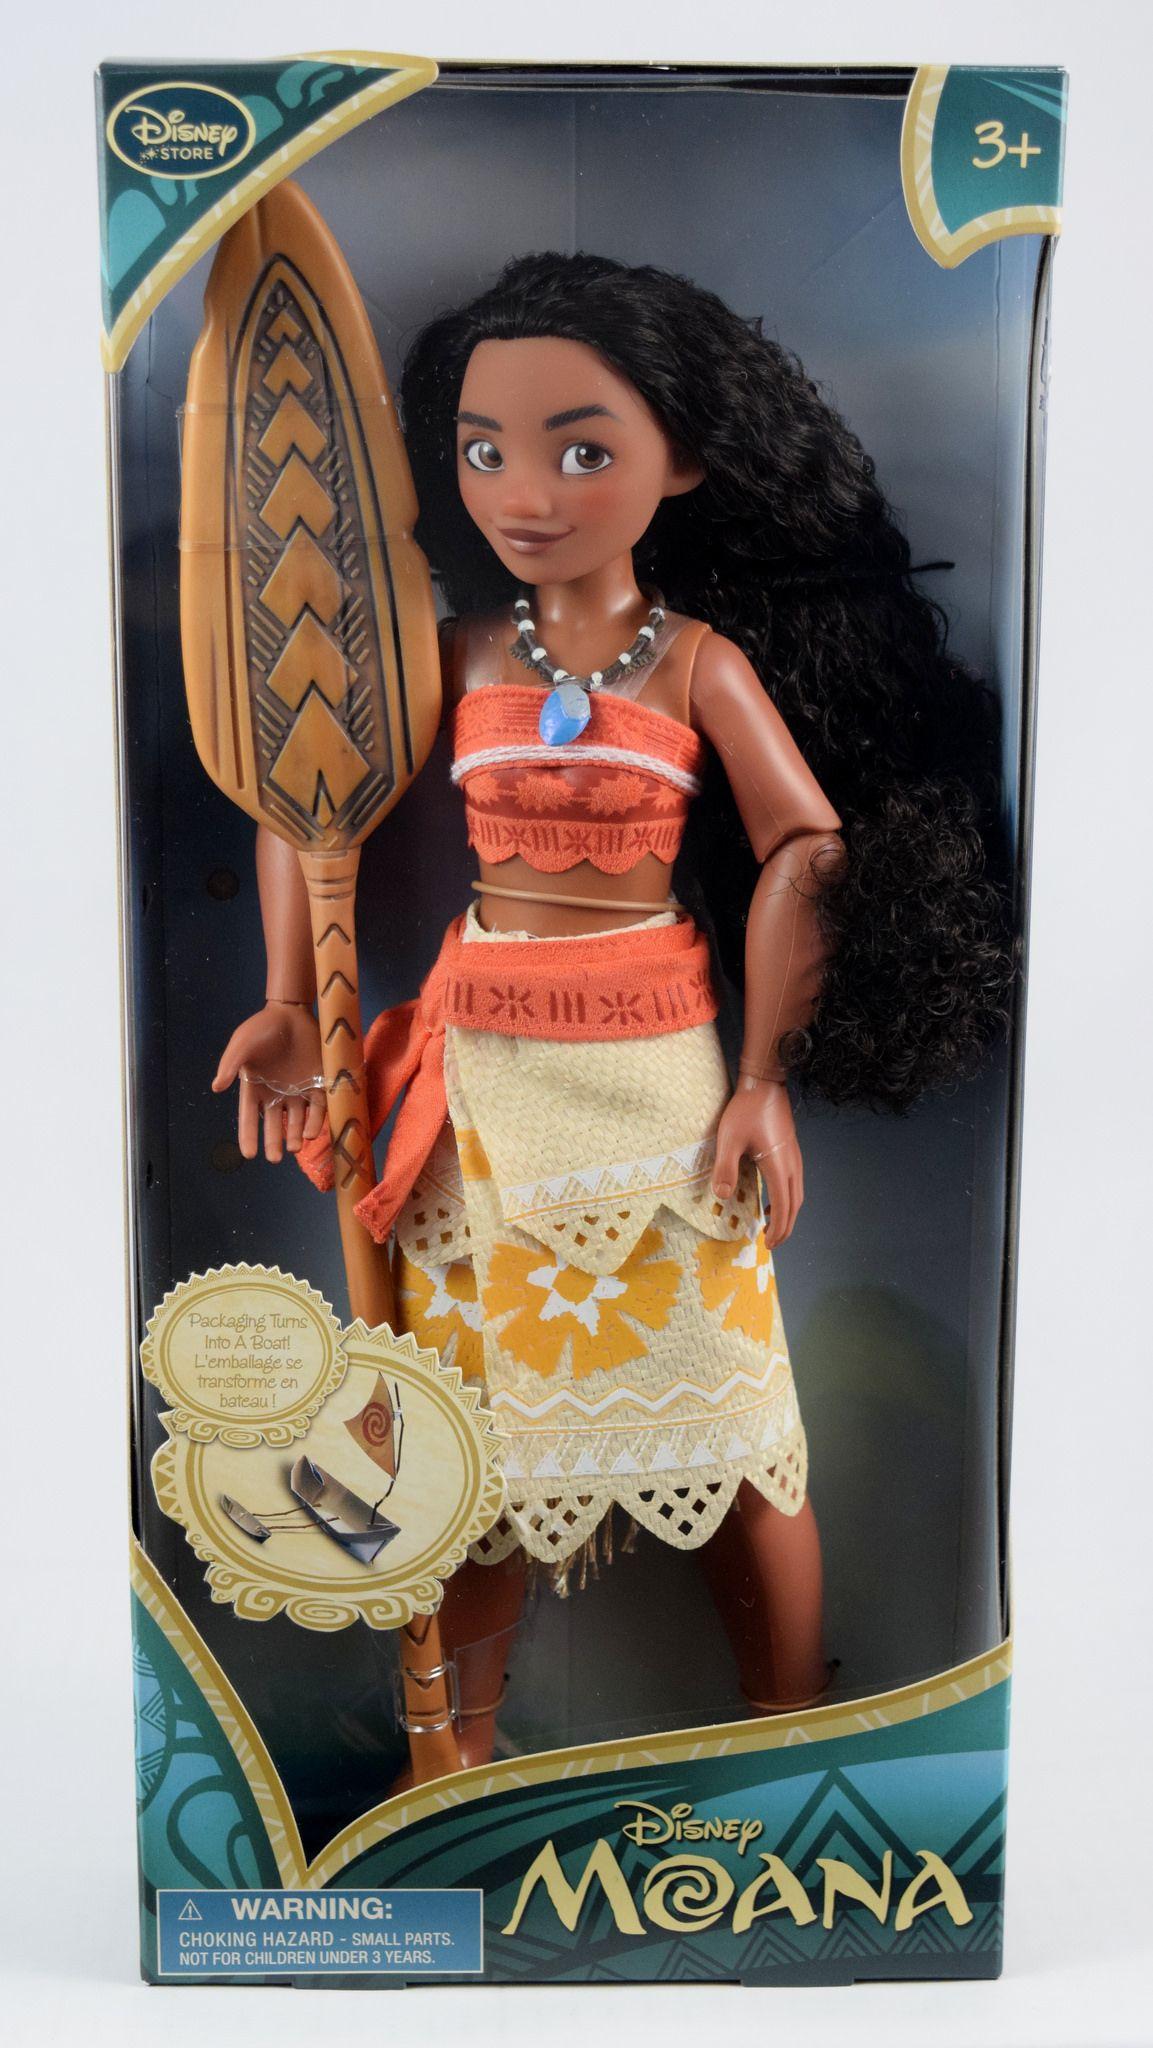 Disney Moana Classic Doll - 11\'\' - Disney Store Purchase - Boxed ...